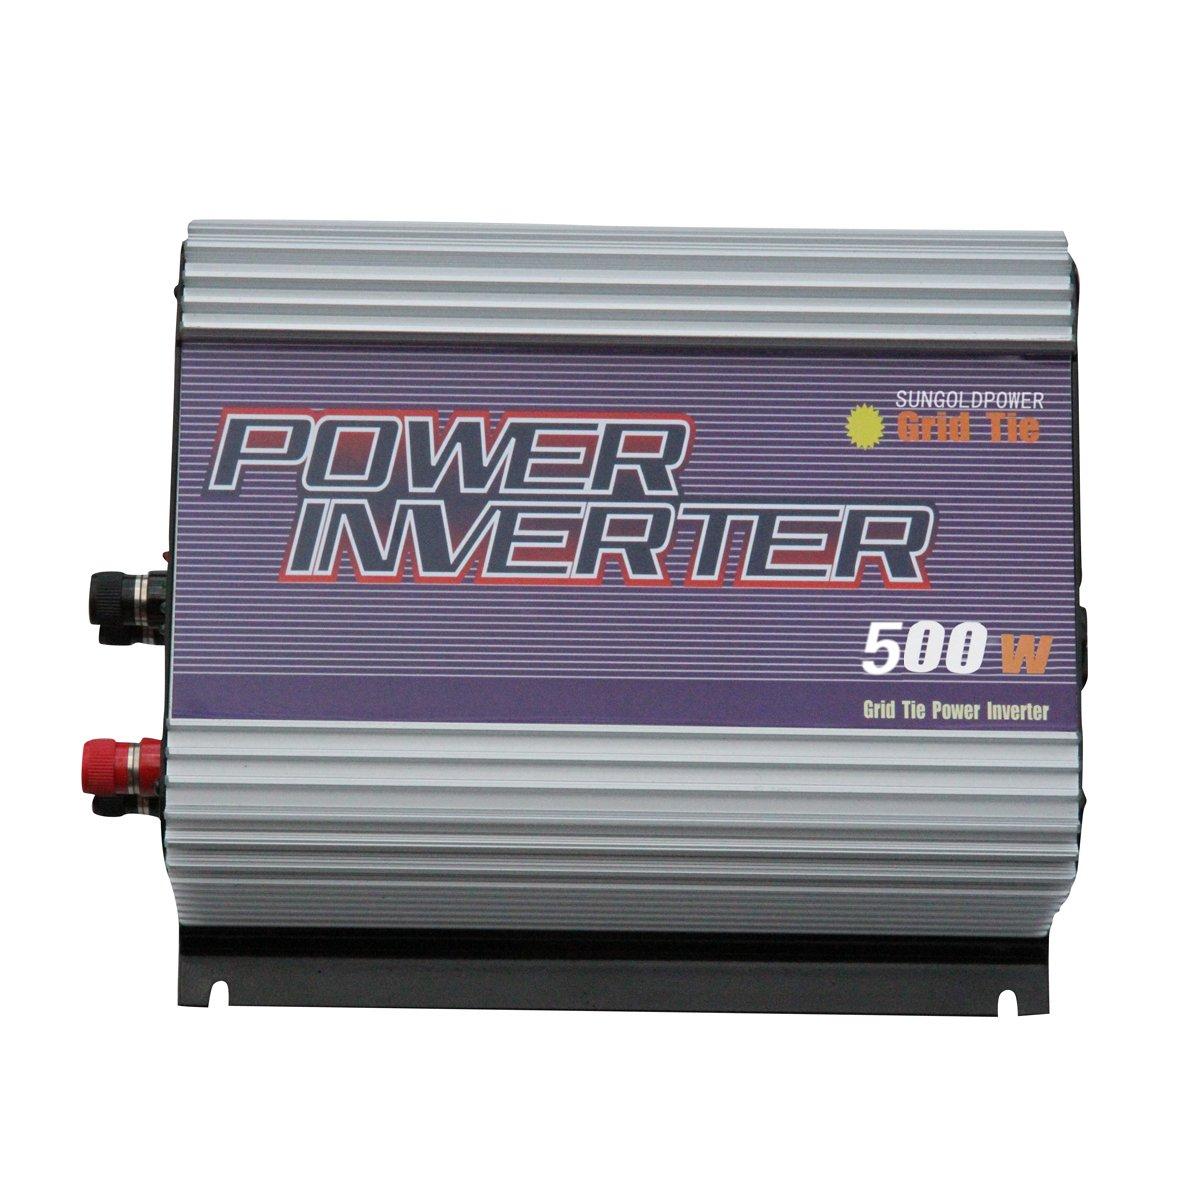 500W Grid Tie MPPT Power Inverter For Wind Turbine Generator System DC 22V-60V AC 230V Converter SUNGOLDPOWER